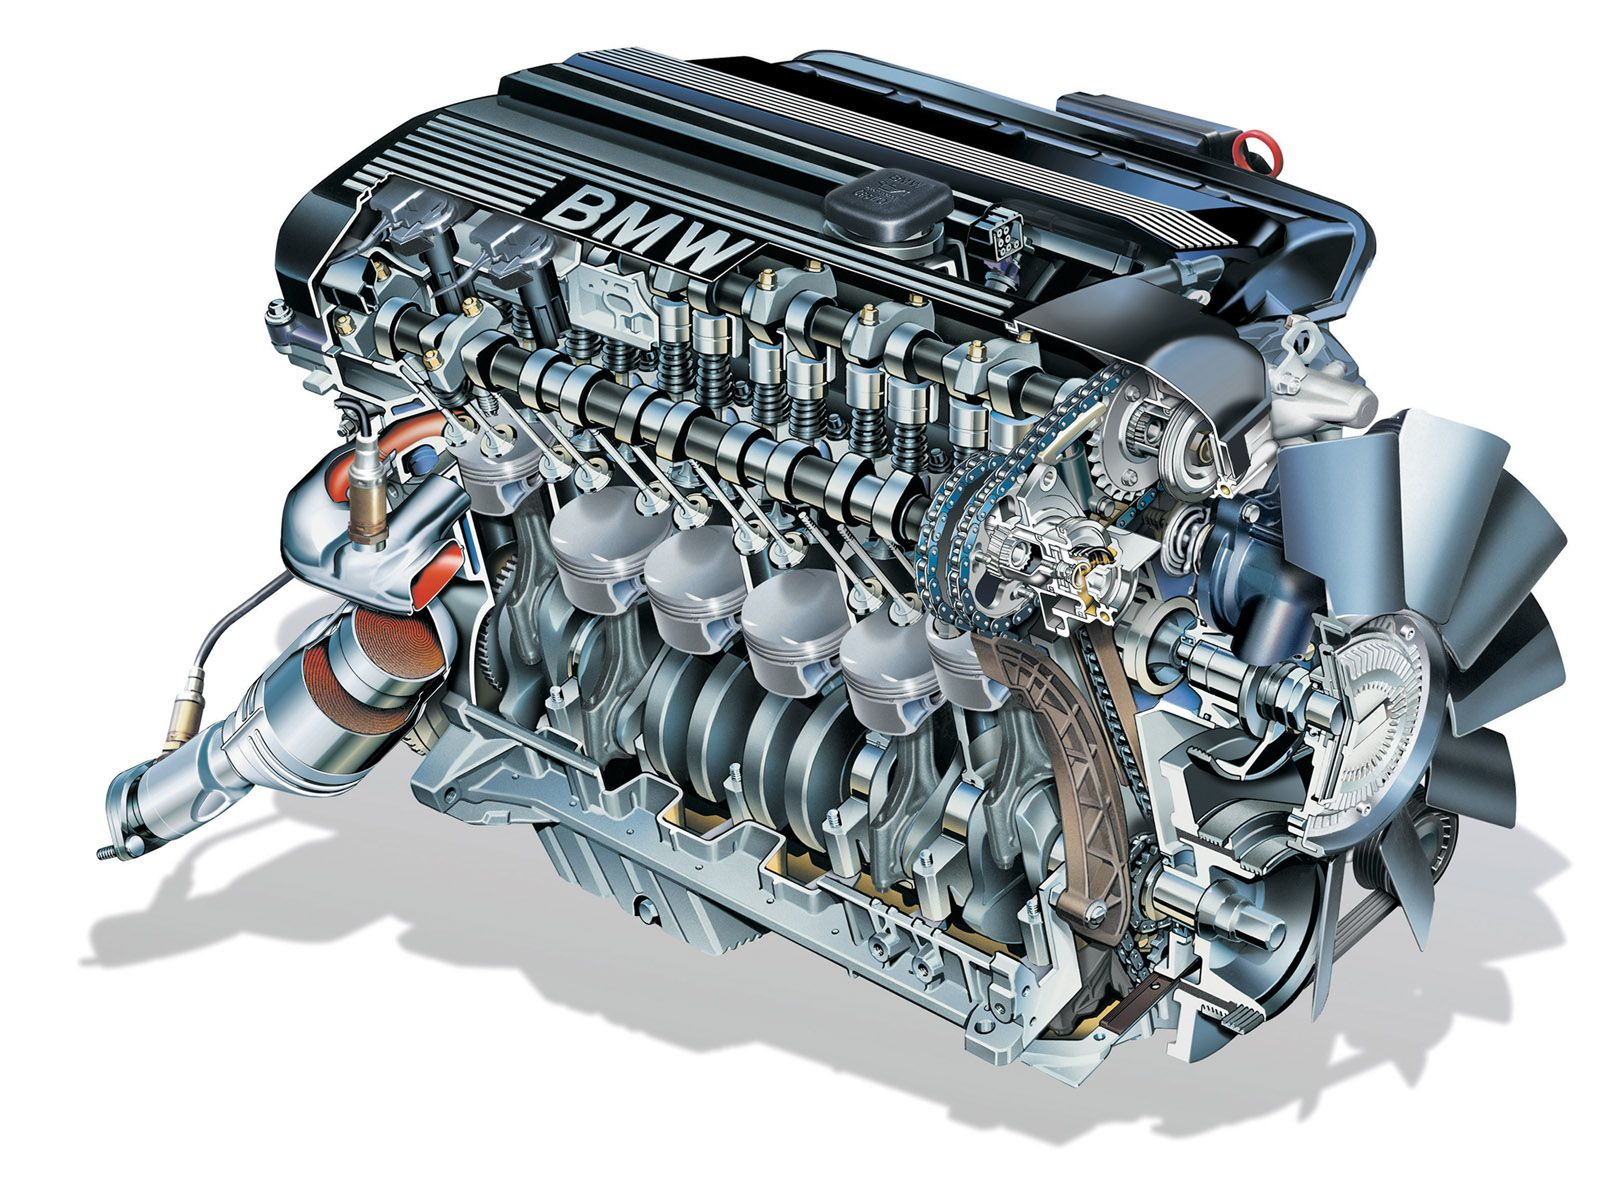 BMW Z4 Roadster Engine Wallpaper